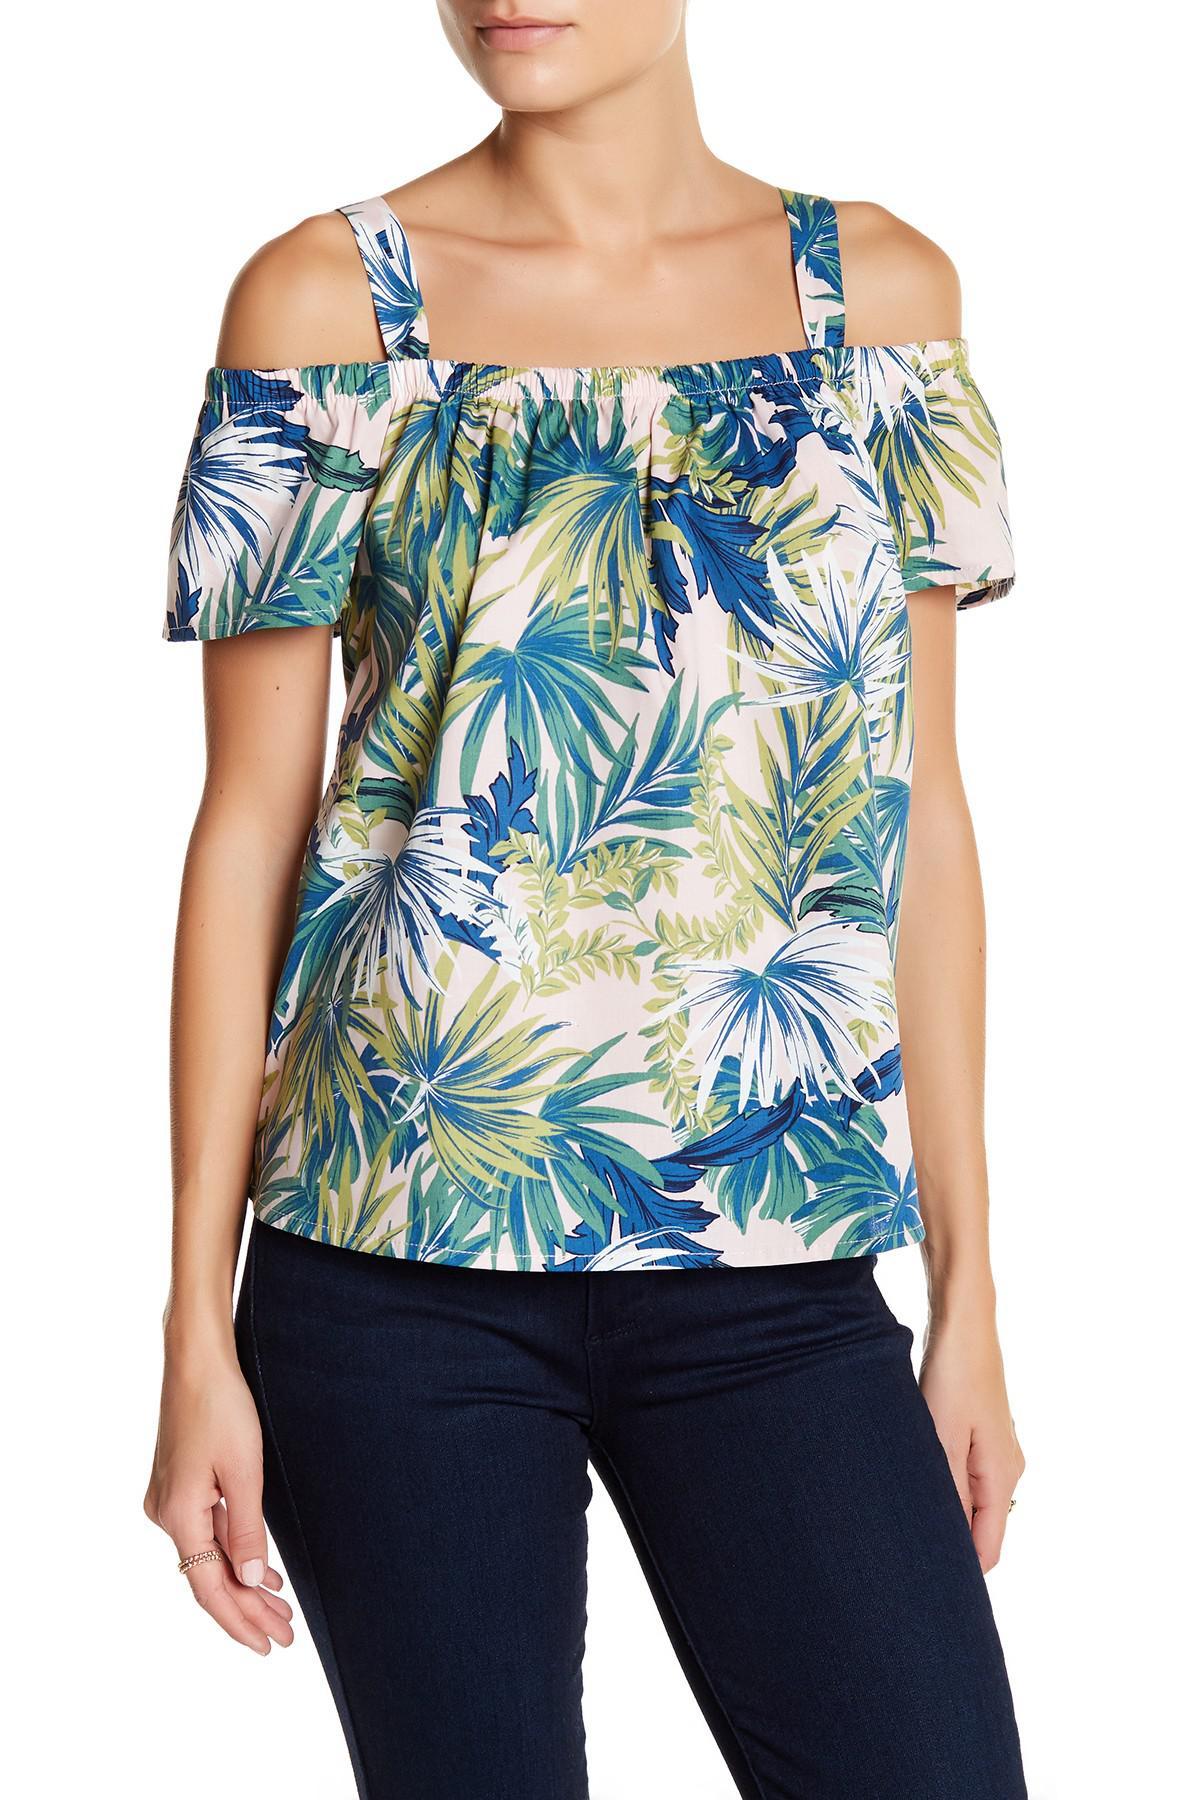 dcfe36176efc7 Lyst - Bobeau Floral Cold-shoulder Blouse (petite) in Blue